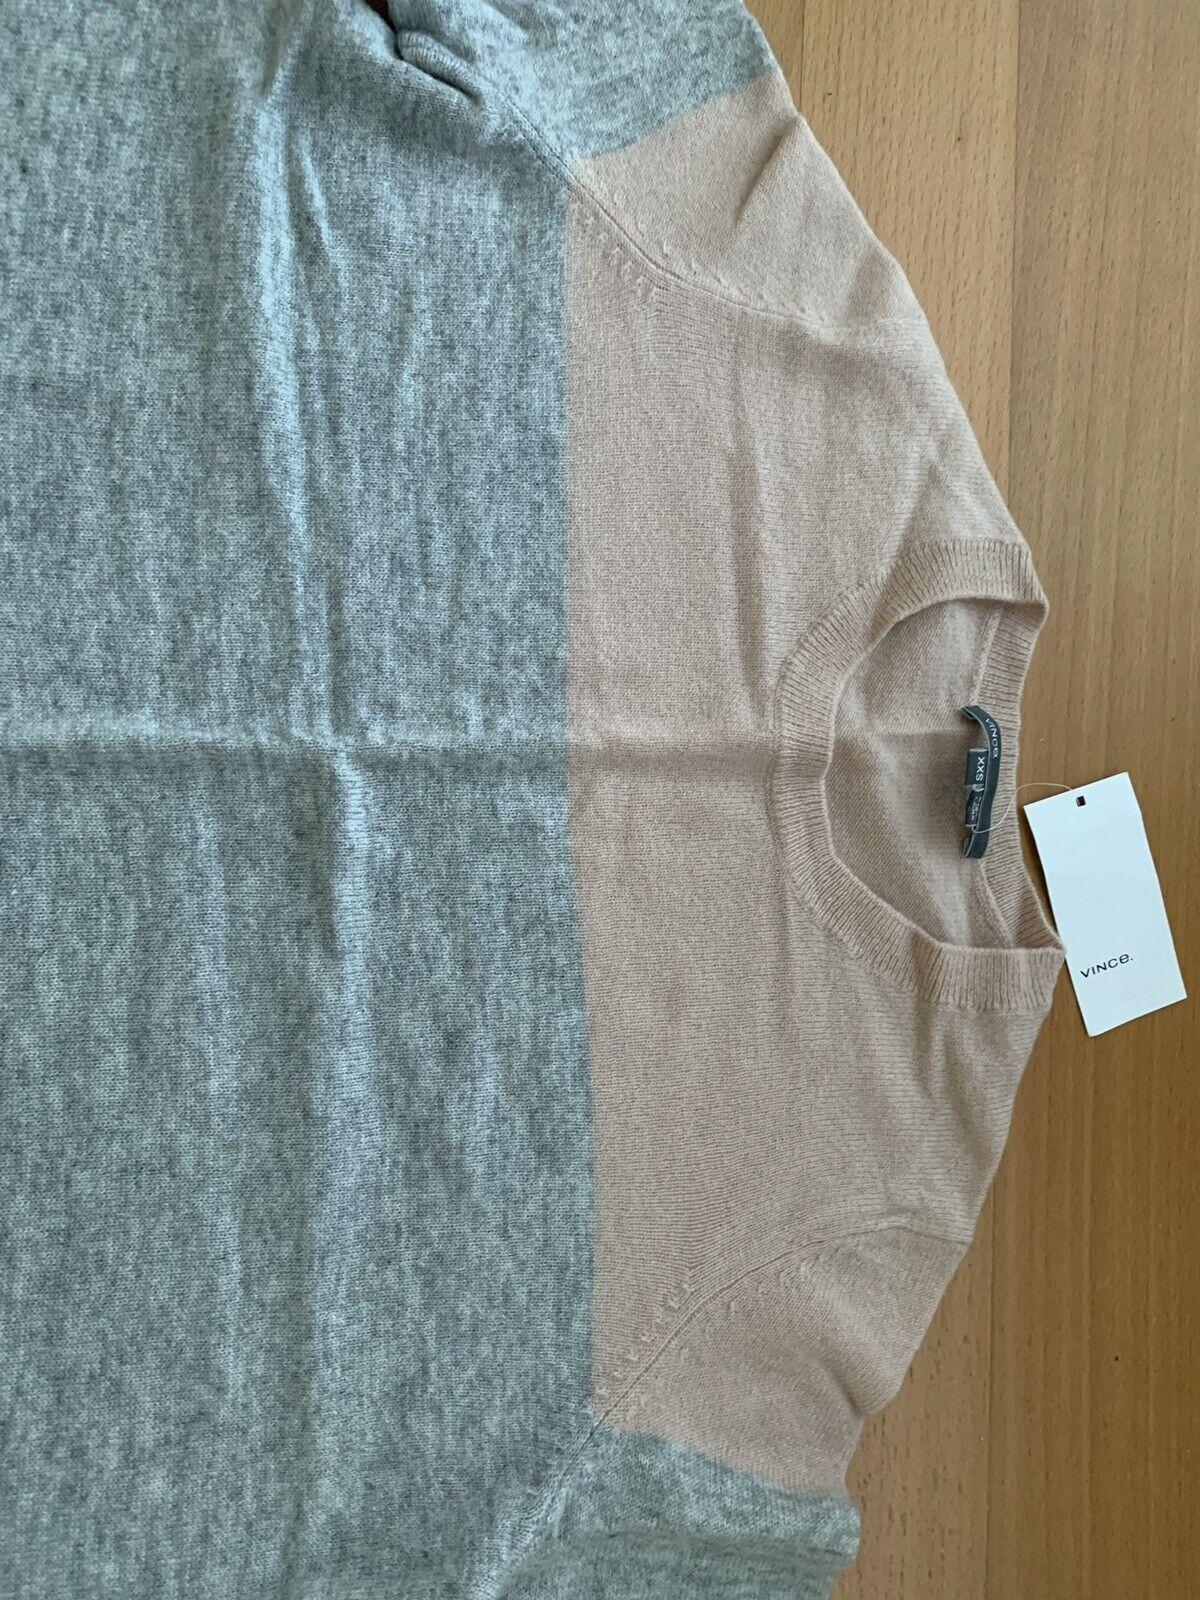 Vince NWT  235 salmon salmon salmon grey combo cashmere sweater top XXS ef037a